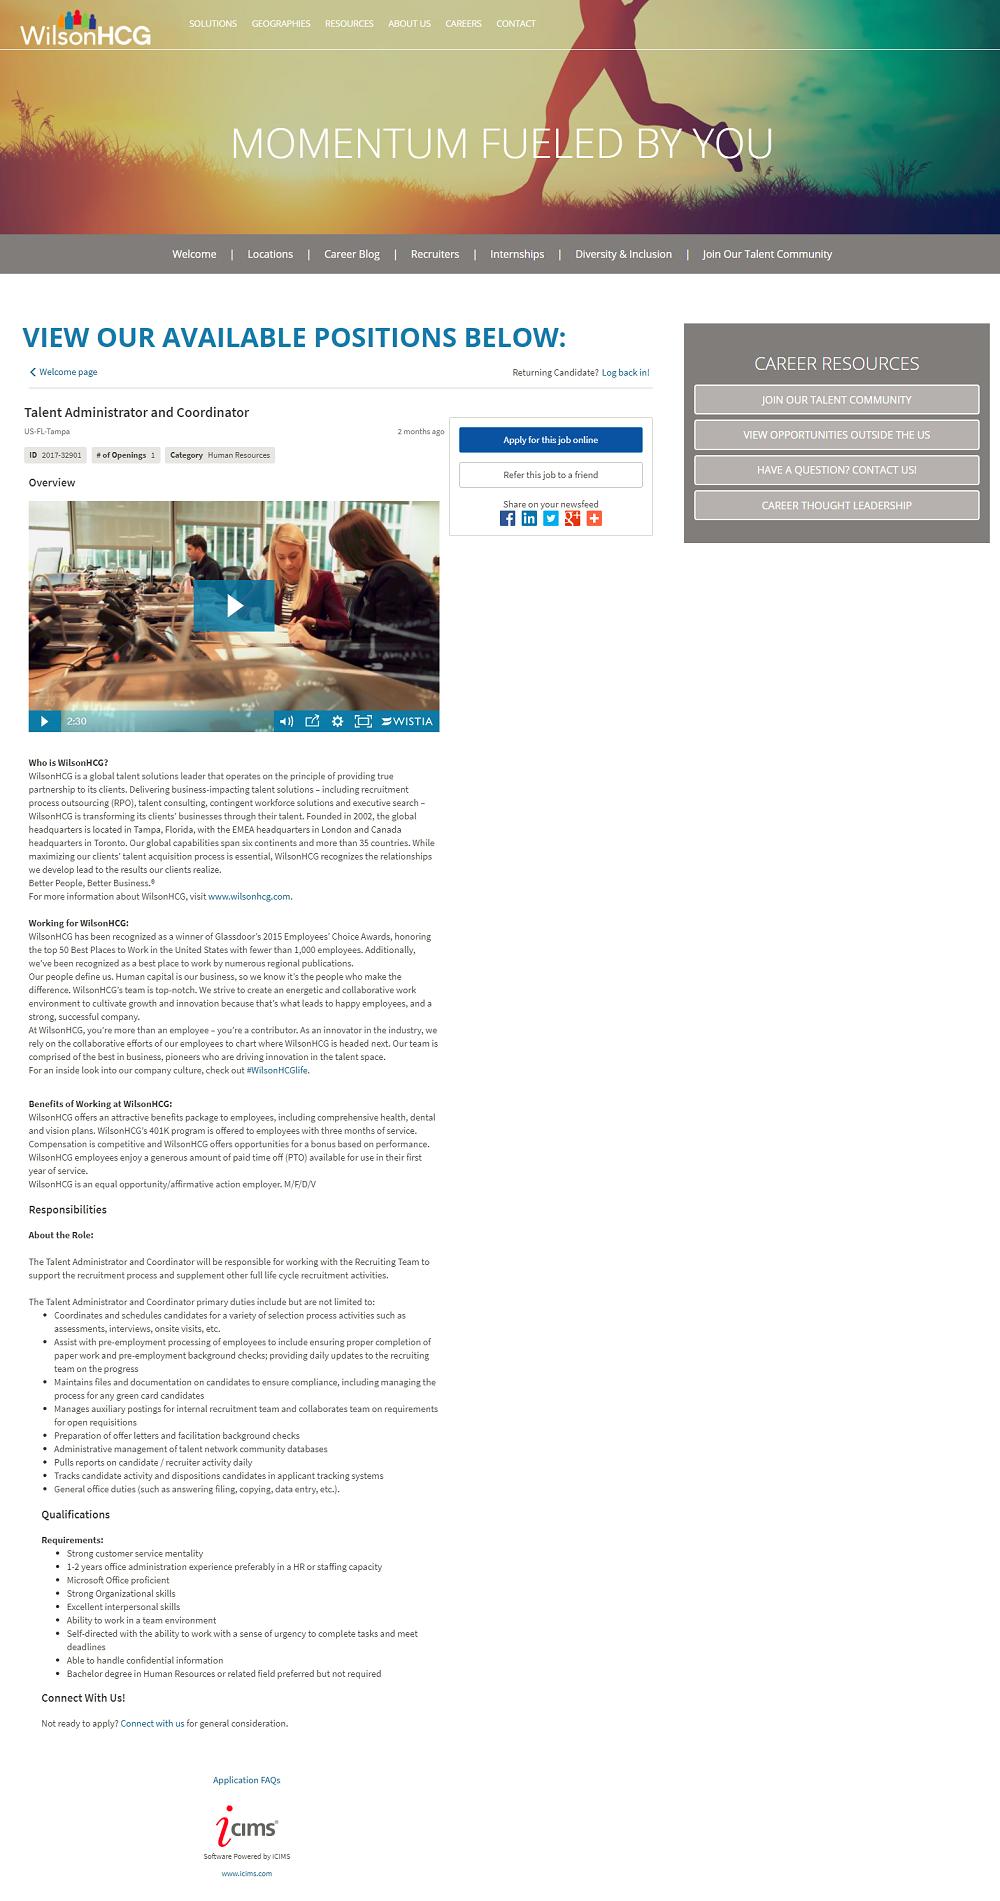 WilsonHCG iCims ATS Job Description Pages